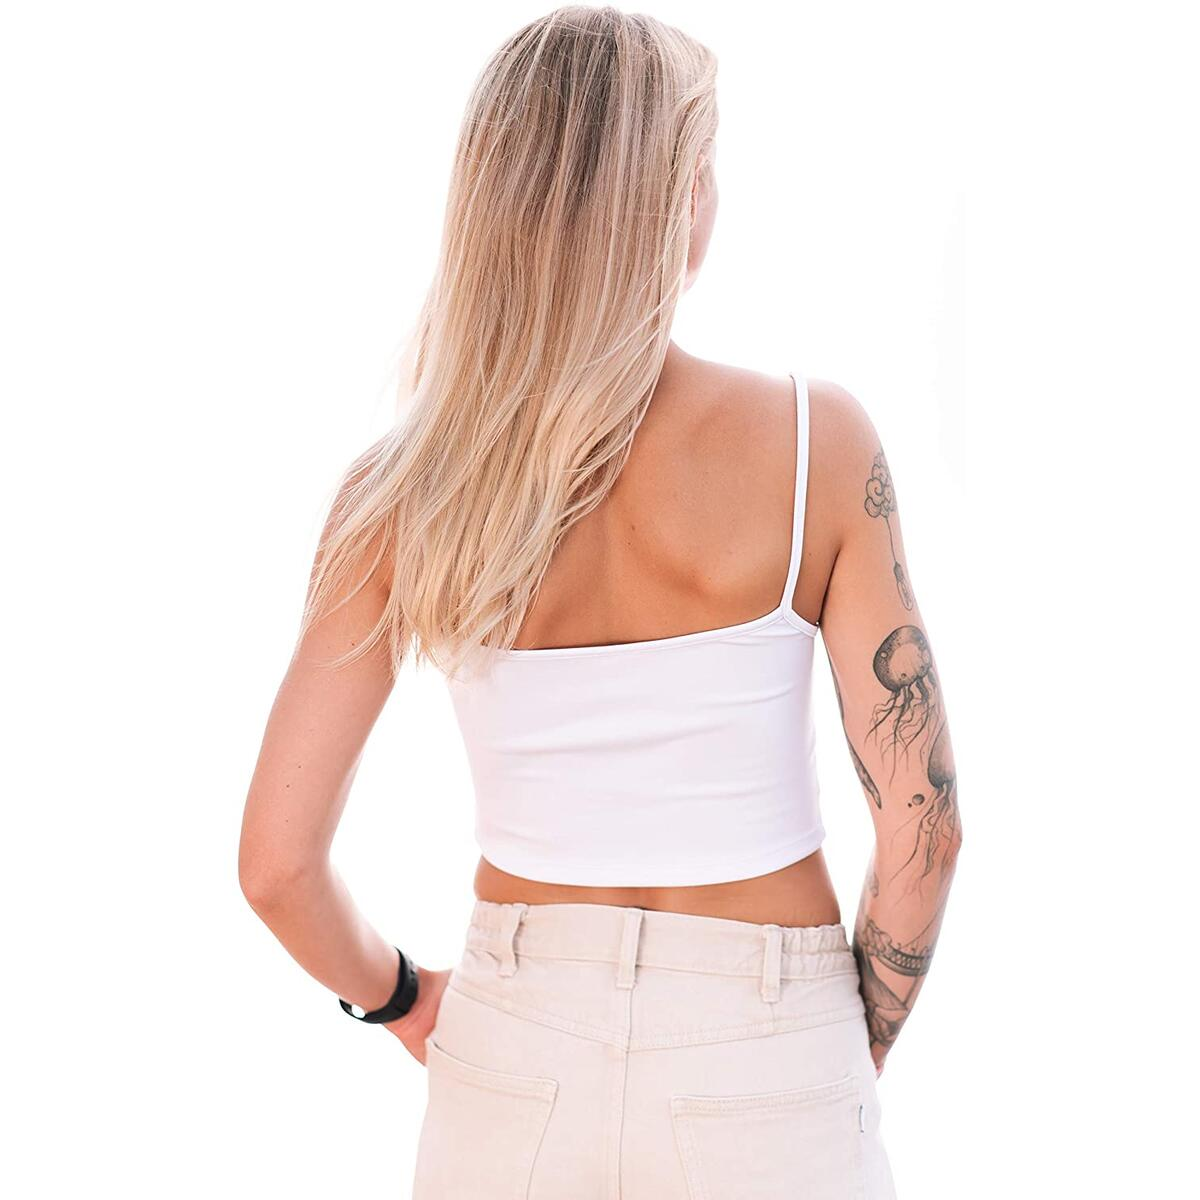 Cute White Crop Tank Top for Women Longline Casual Sleeveless Stretch Yoga Basic Spaghetti Strap (White, S)